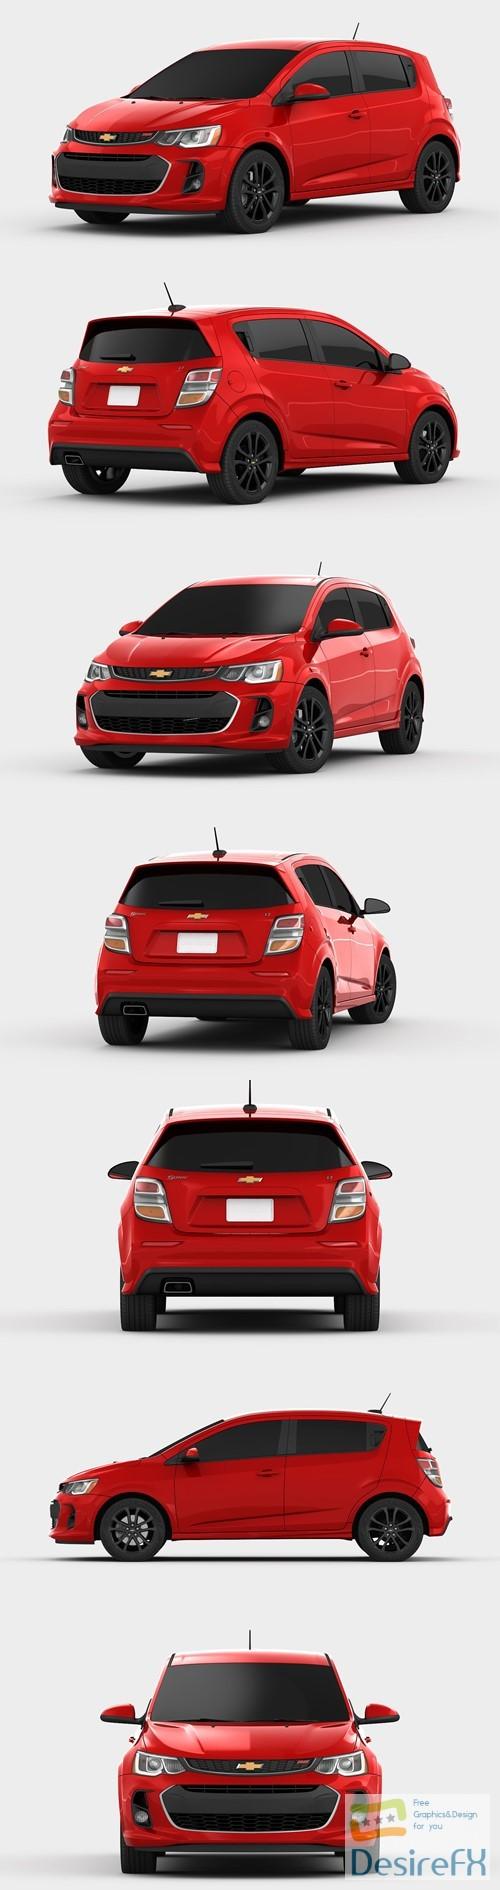 Chevrolet Sonic Hatchback 2017 3D Model